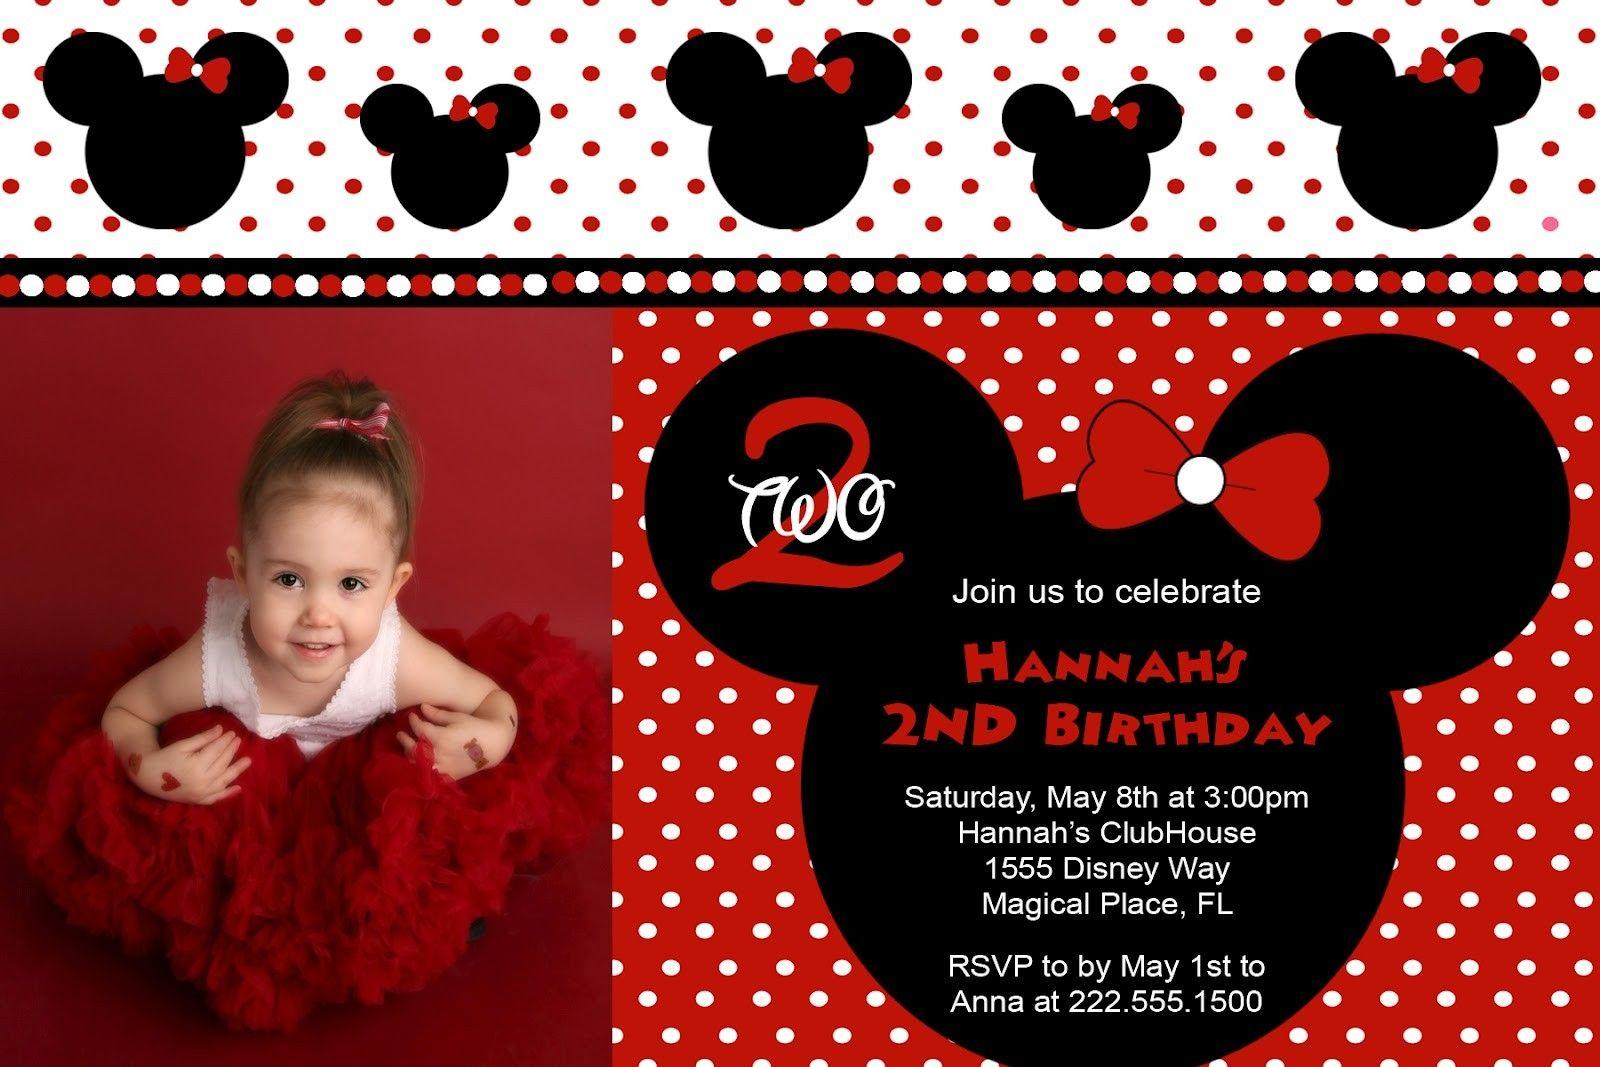 Baby Mickey Mouse 1St Birthday Invitations is good invitation design